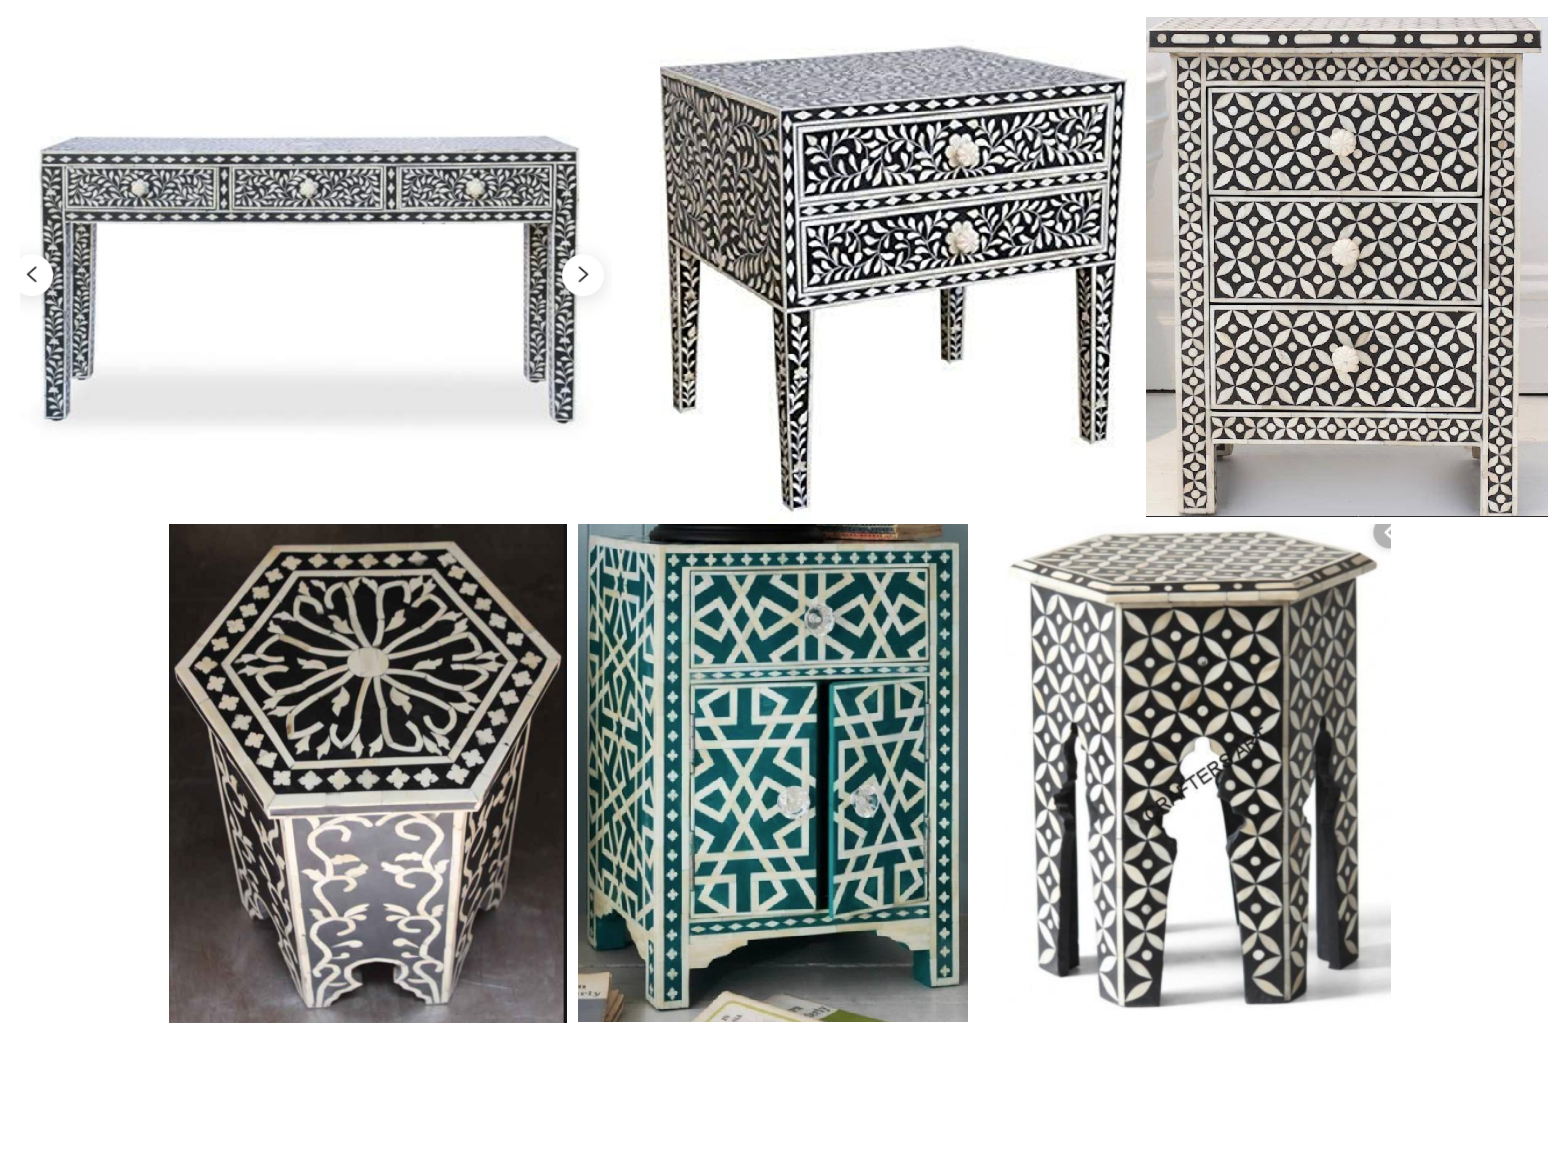 Bone Inlay Furniture With Images Bone Inlay Furniture Bone